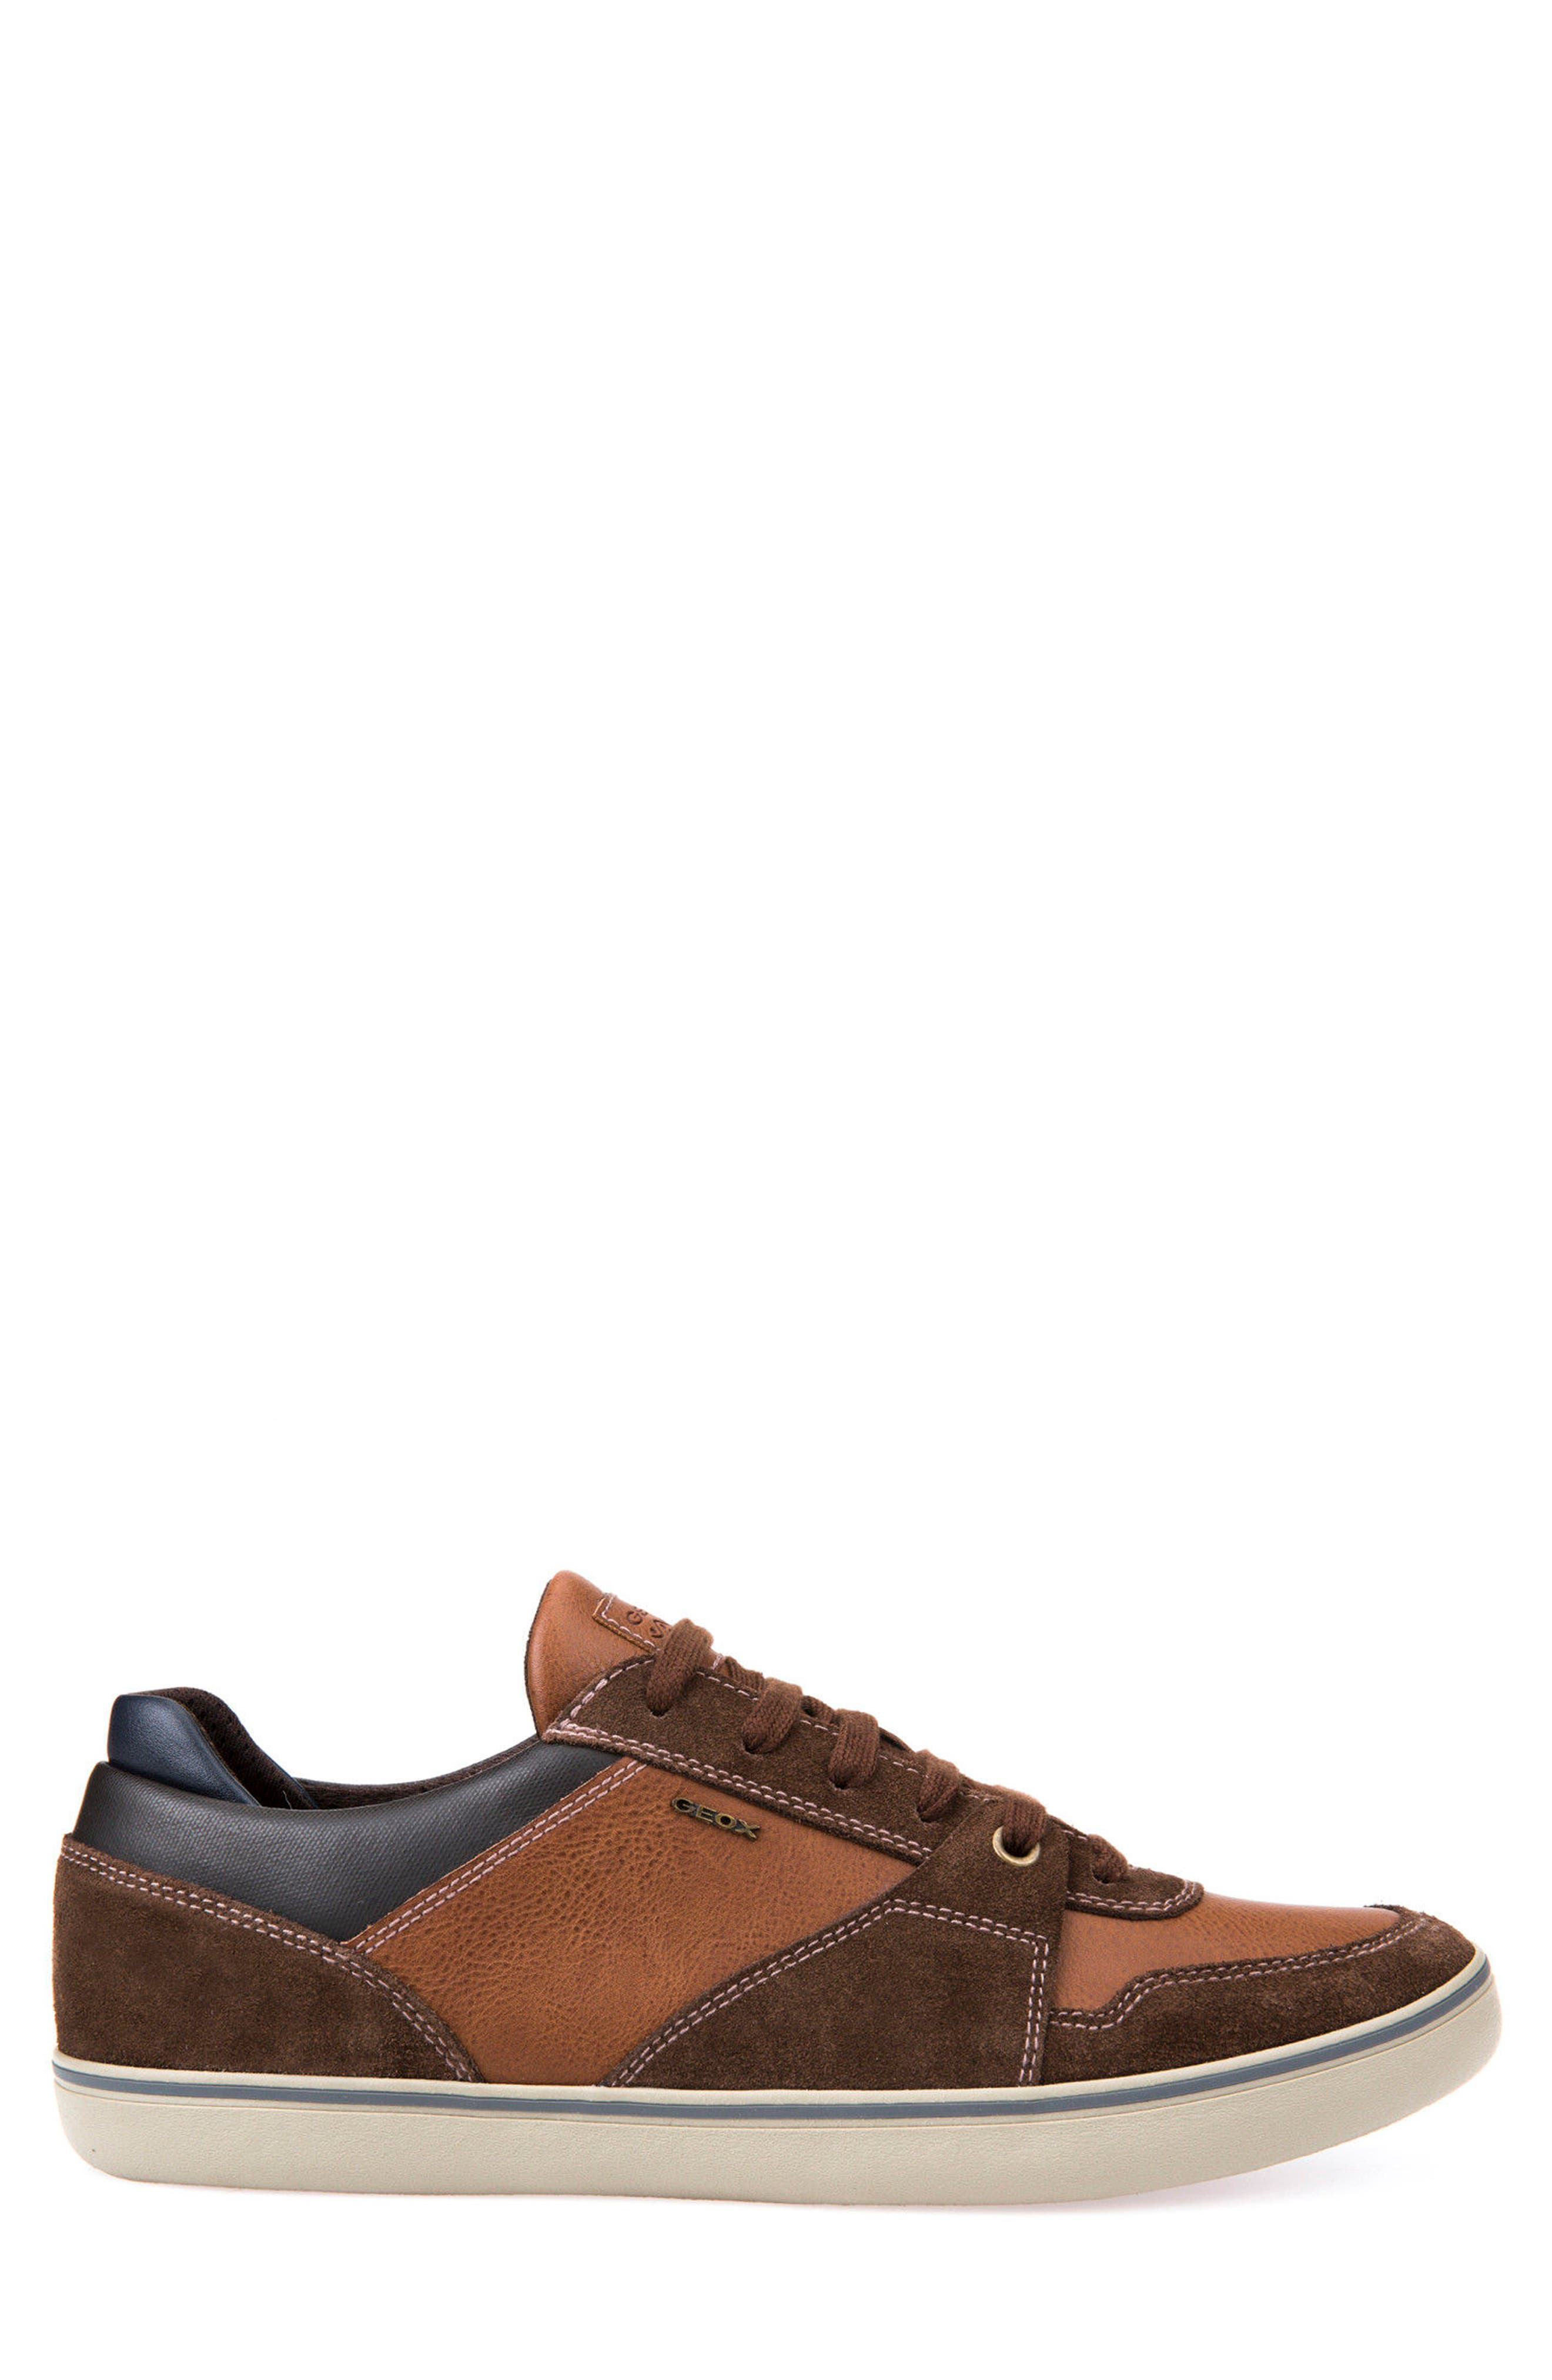 Box 27 Low-Top Sneaker,                             Alternate thumbnail 3, color,                             Ebony/ Brown Cotto